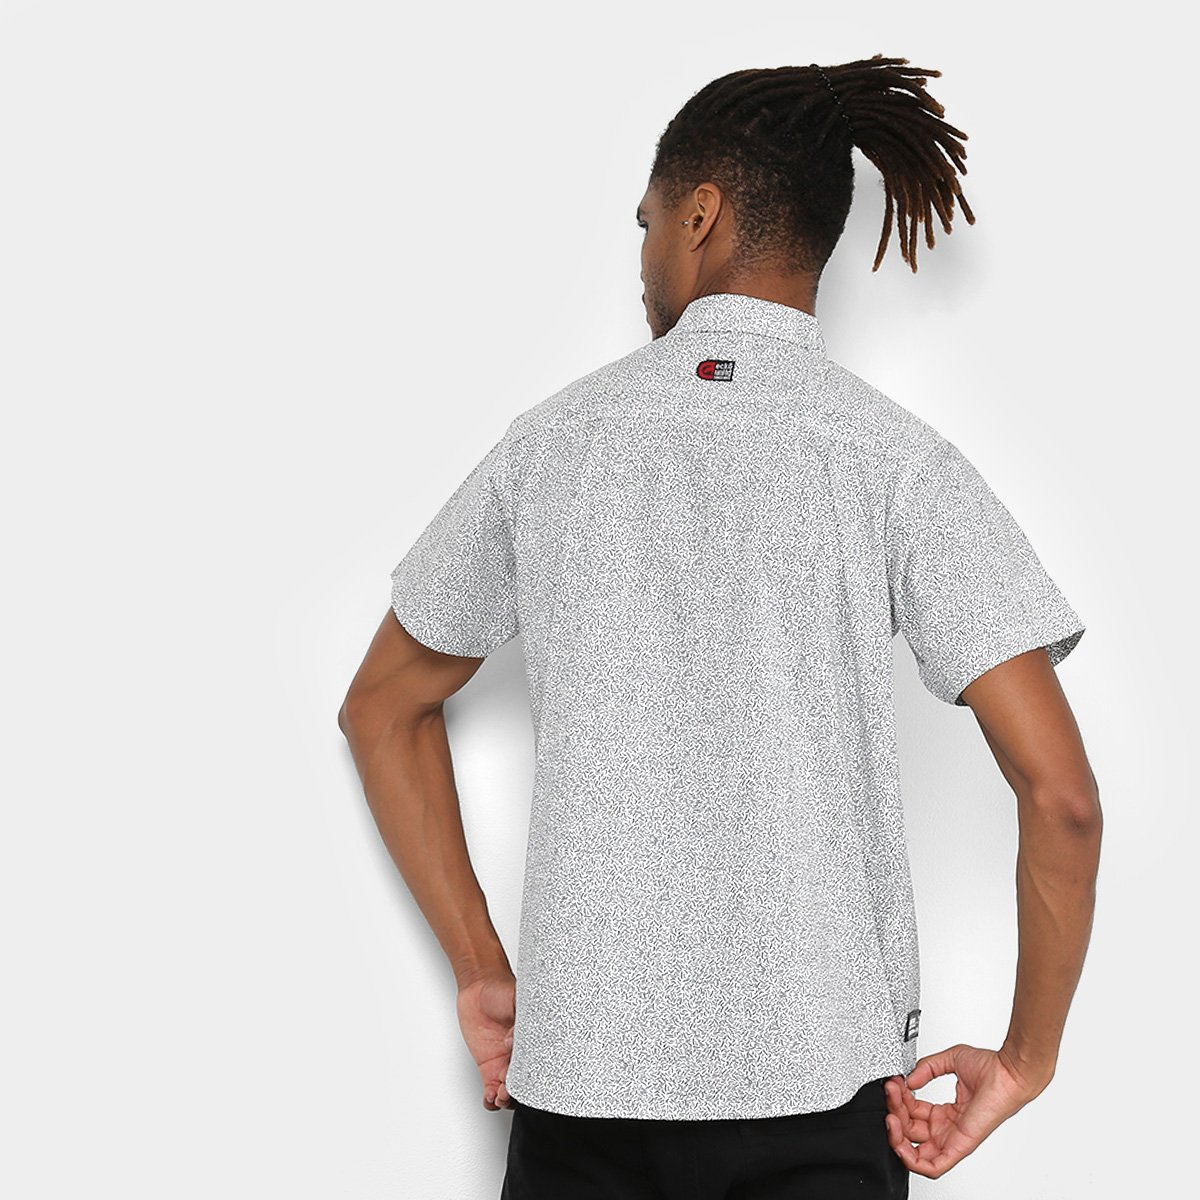 22ac30cf91 Camisa Ecko Manga Curta Ulina Masculina - Branco - Compre Agora ...